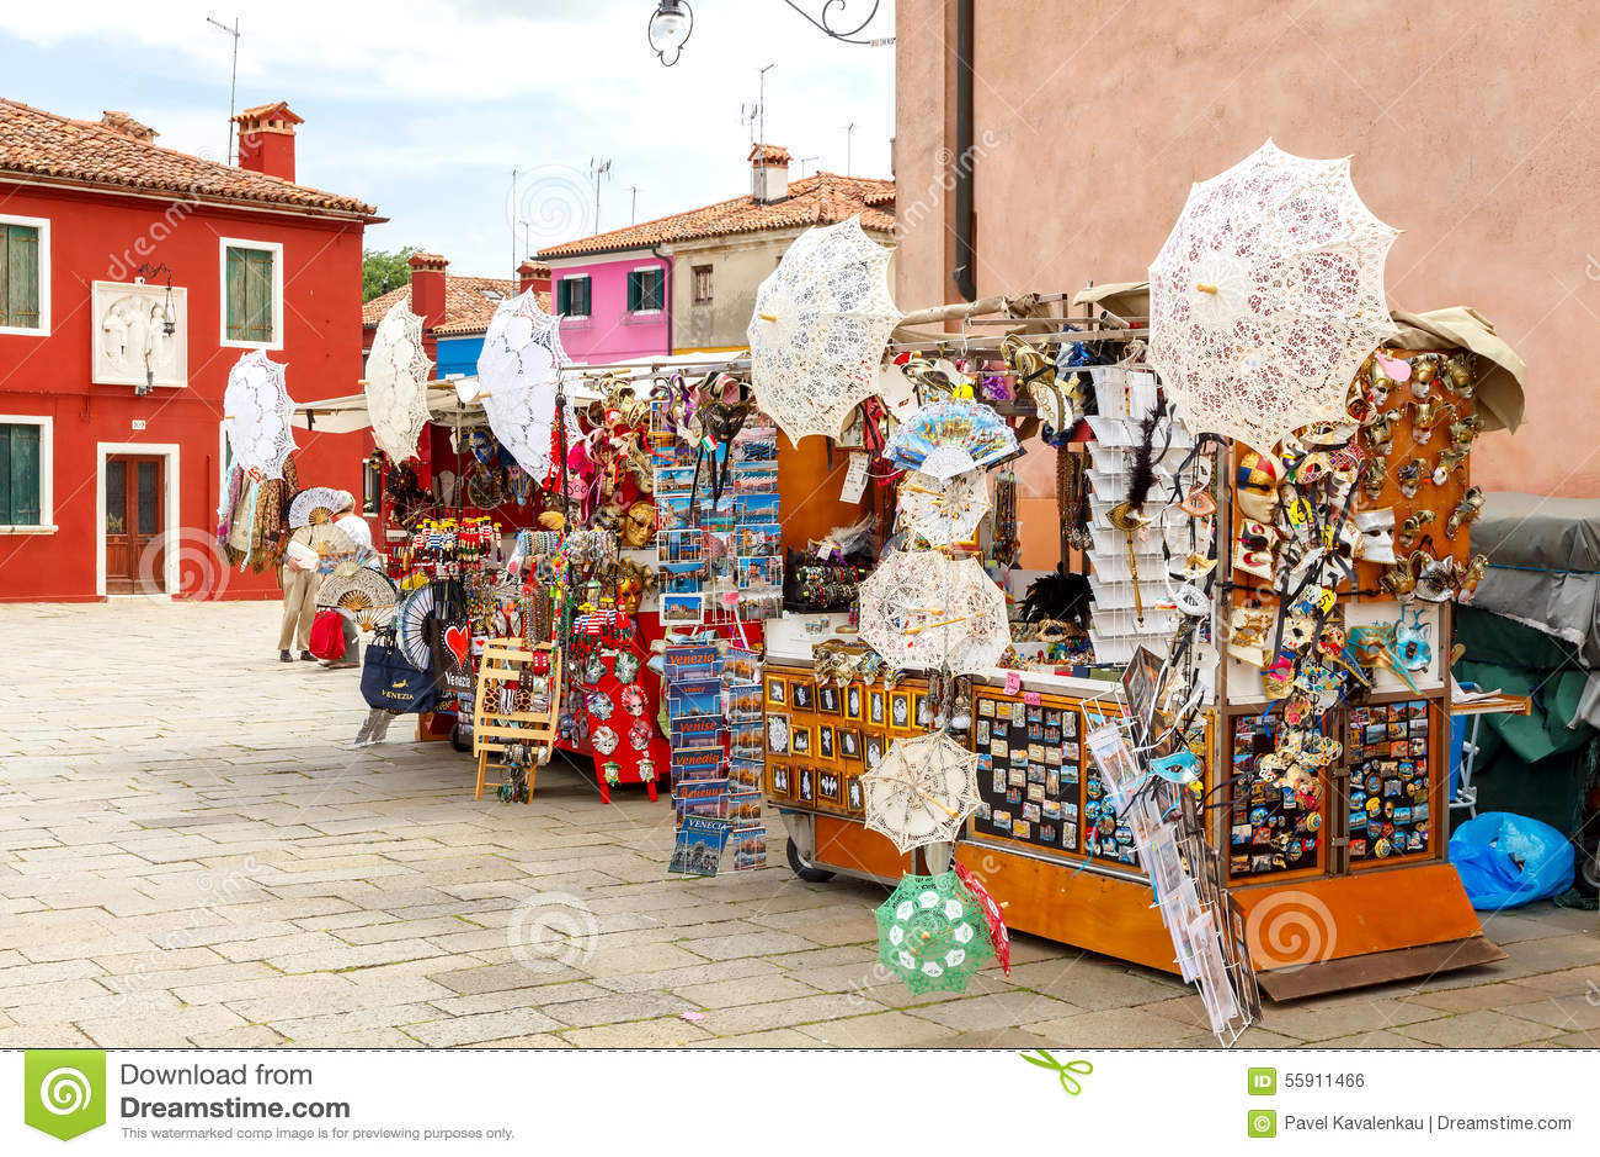 Colorful burano italy burano tourism - The Island Of Burano Editorial Photo